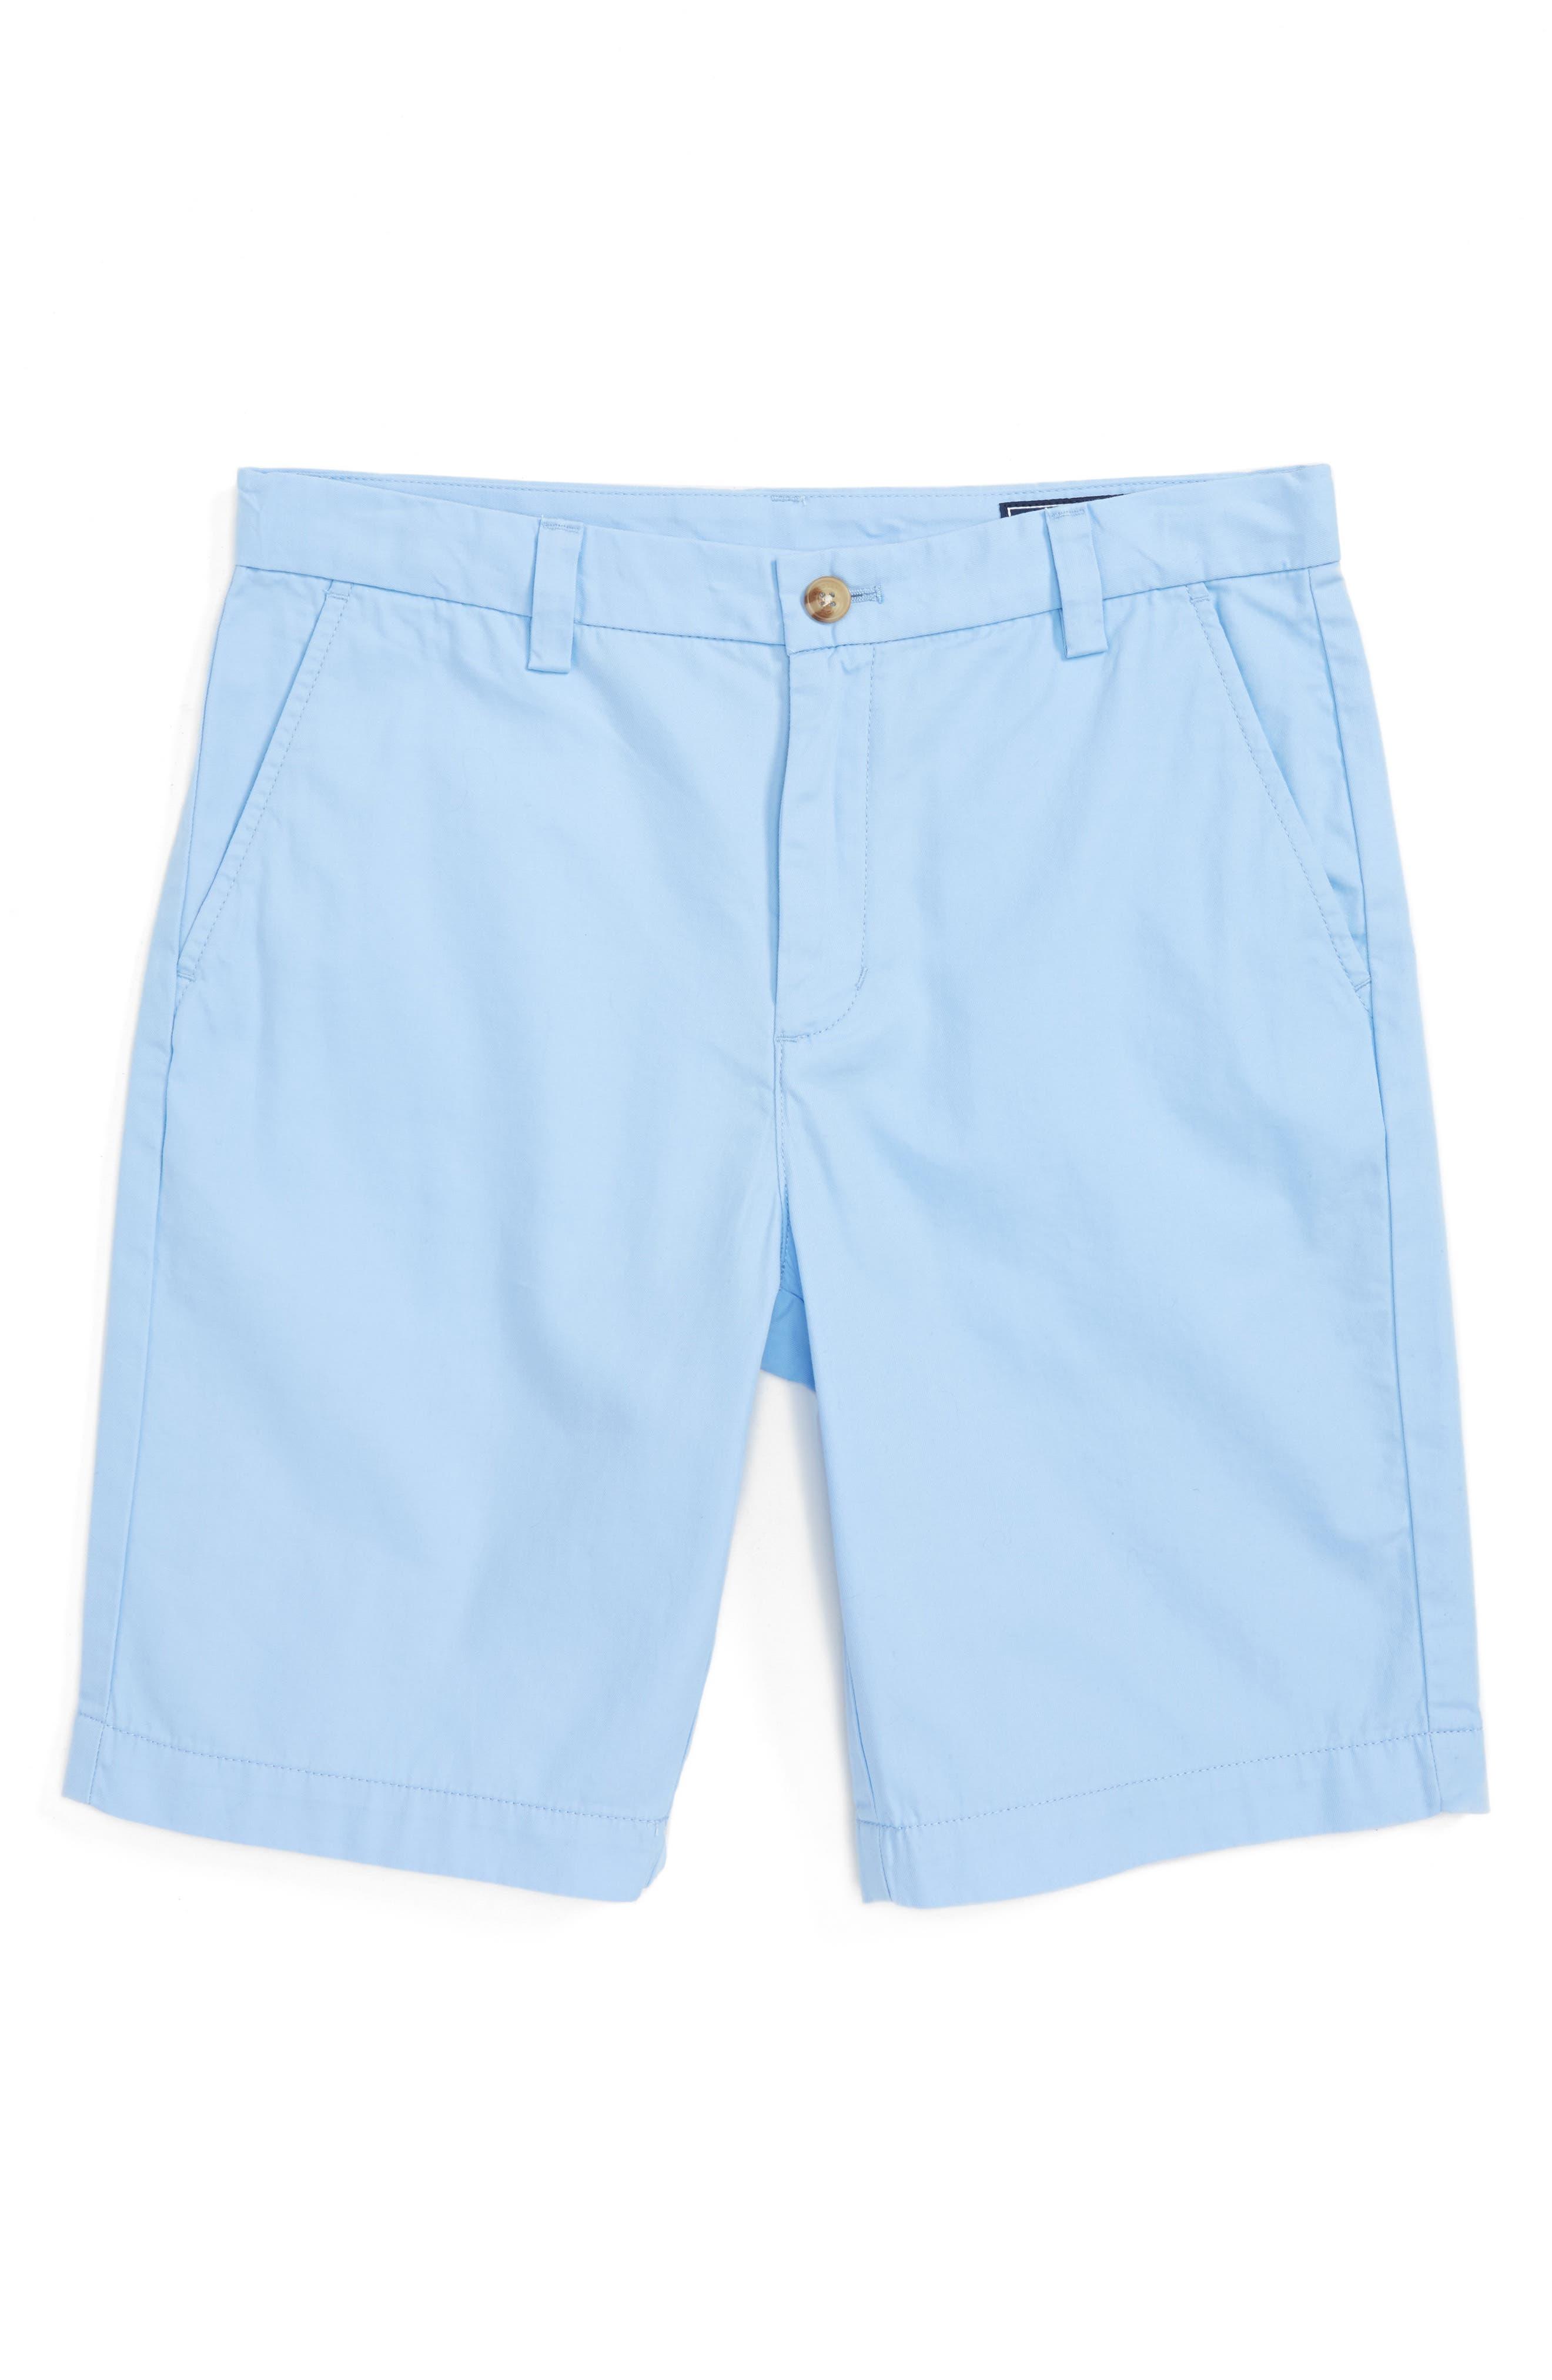 Vineyard Vines Summer - Breaker Twill Shorts (Toddler Boys, Little Boys & Big Boys)